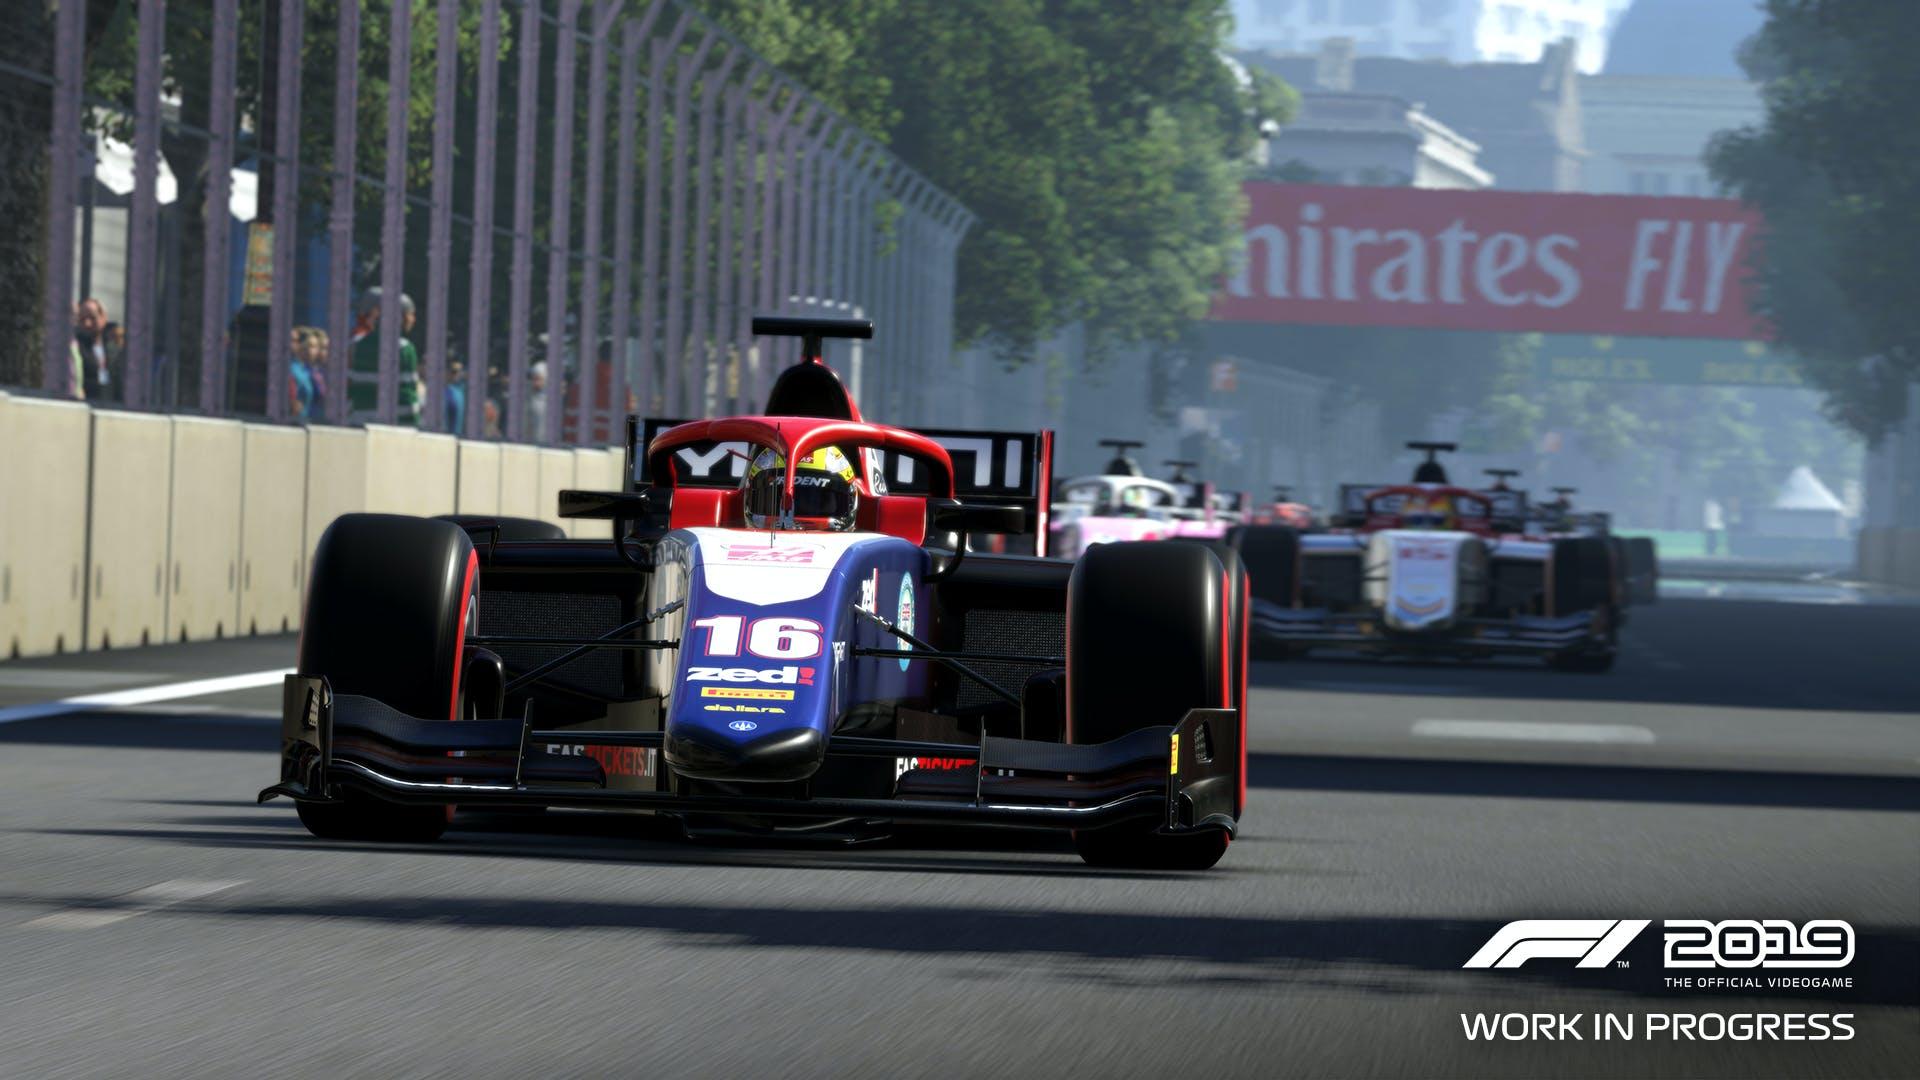 F1 game screenshot